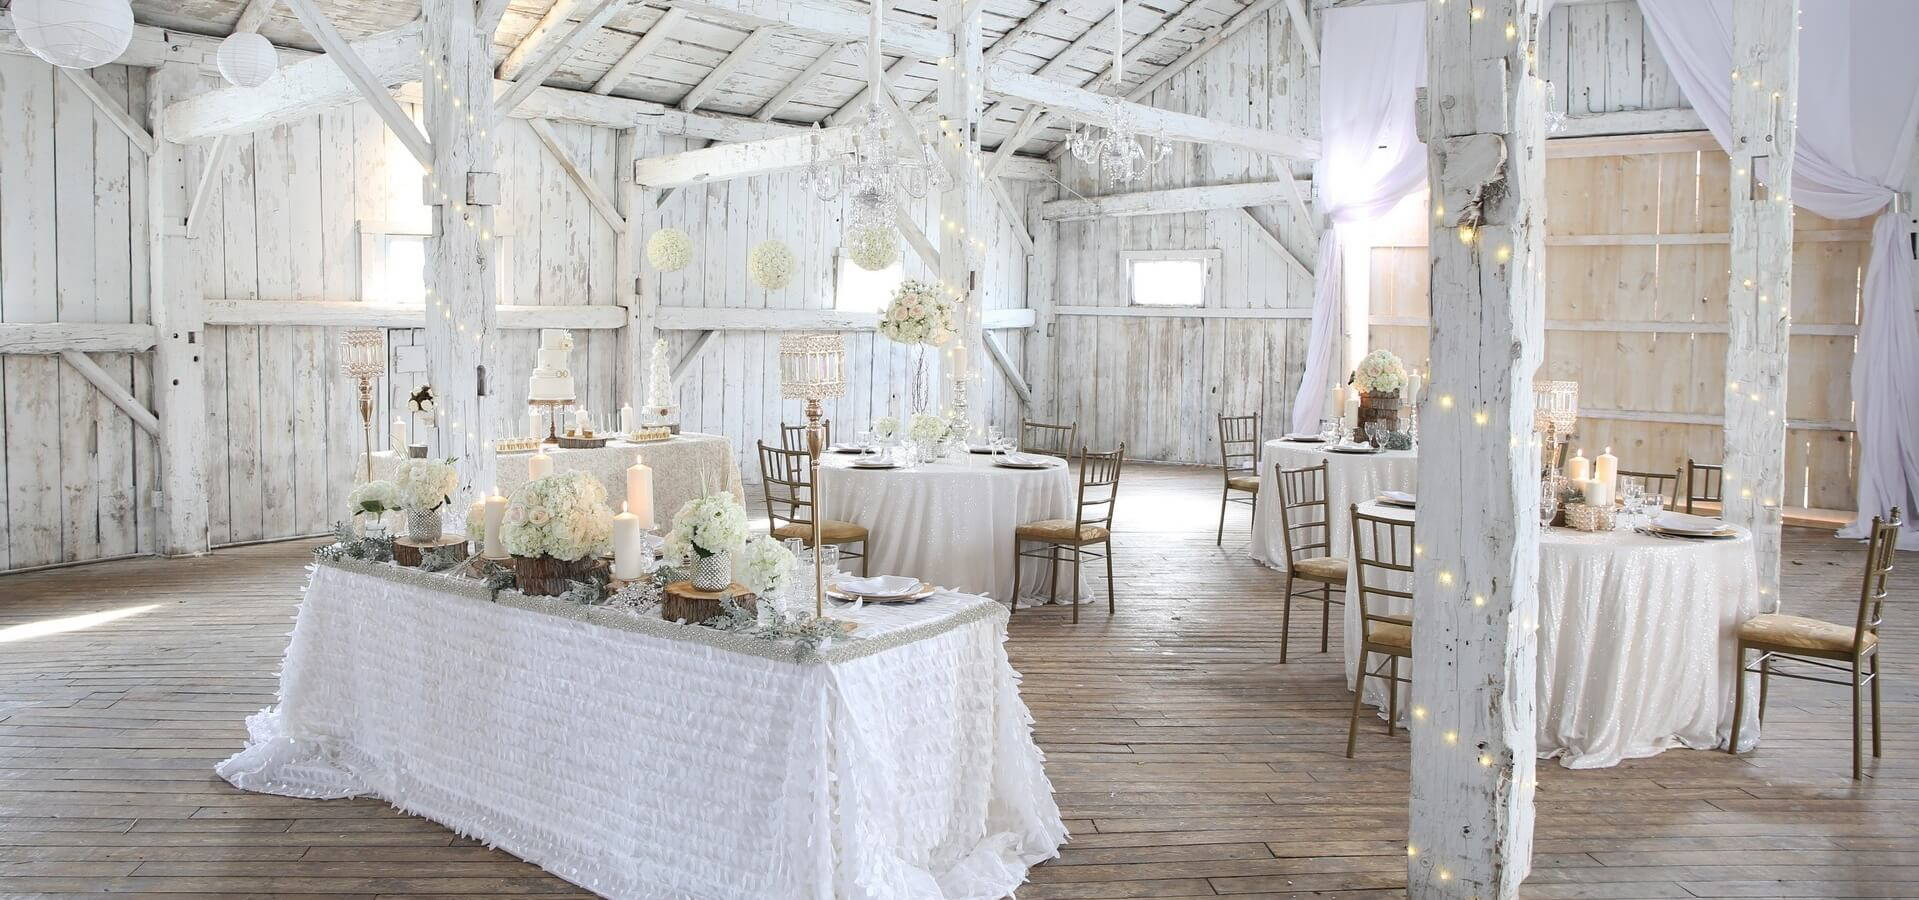 Hero image for Rustically Chic Barn Inspiration at Rainbow Valley Wedding Barn